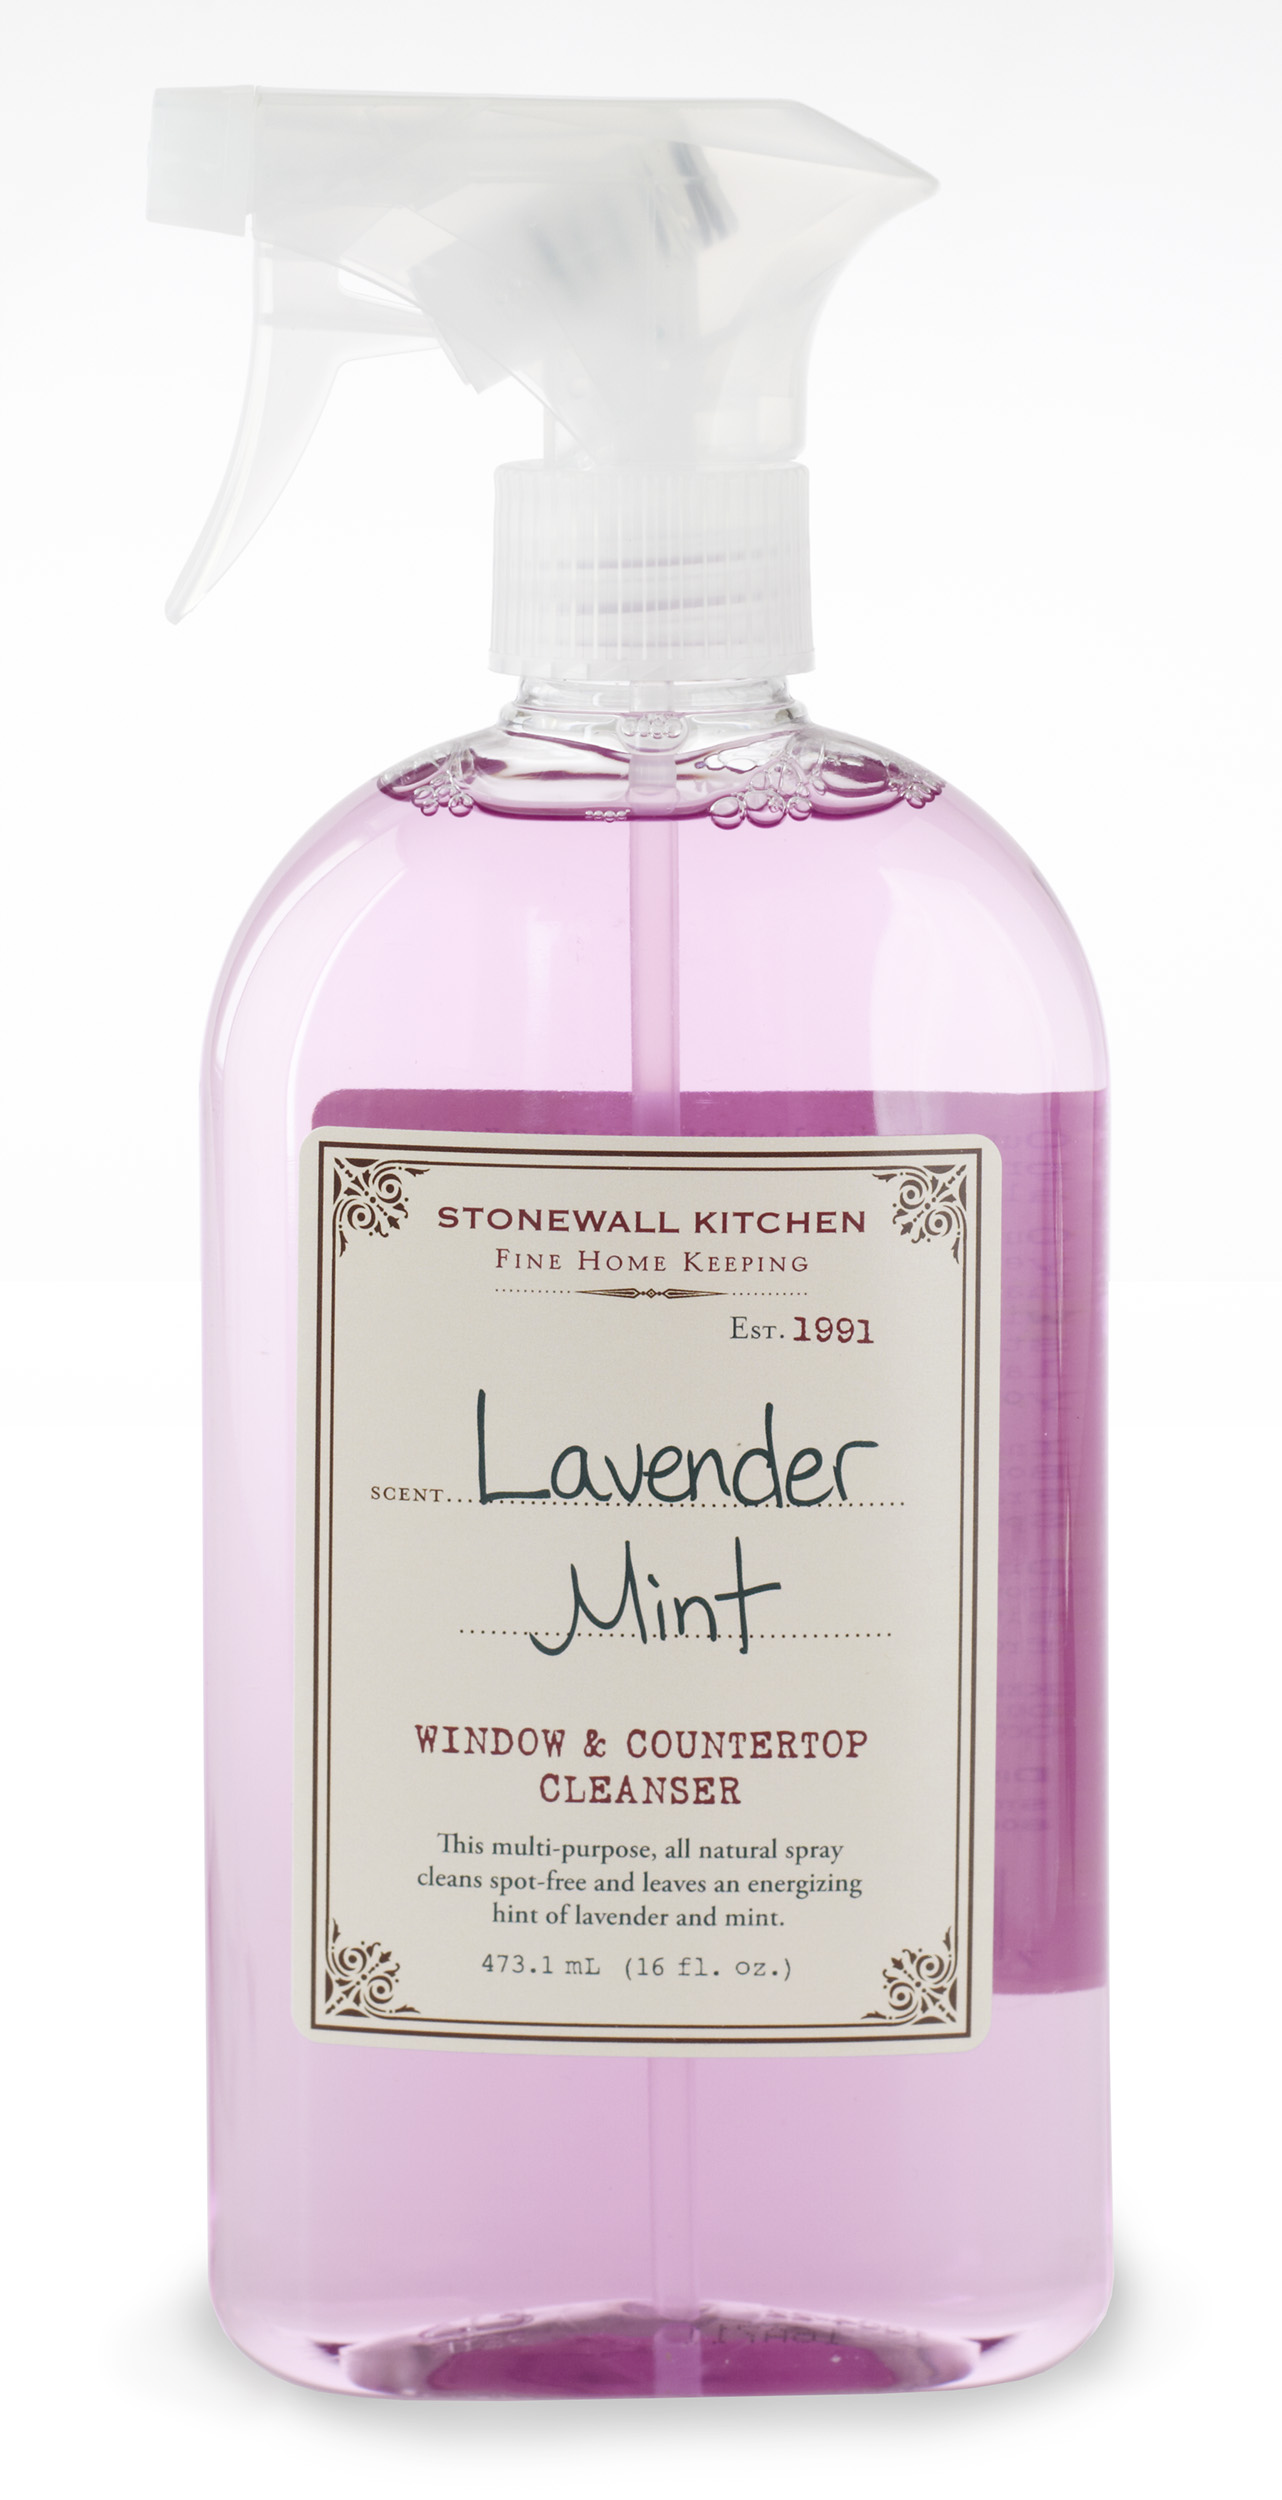 Thumbnail 1 · Stonewall Kitchen WINDOW COUNTER CLEANER ...